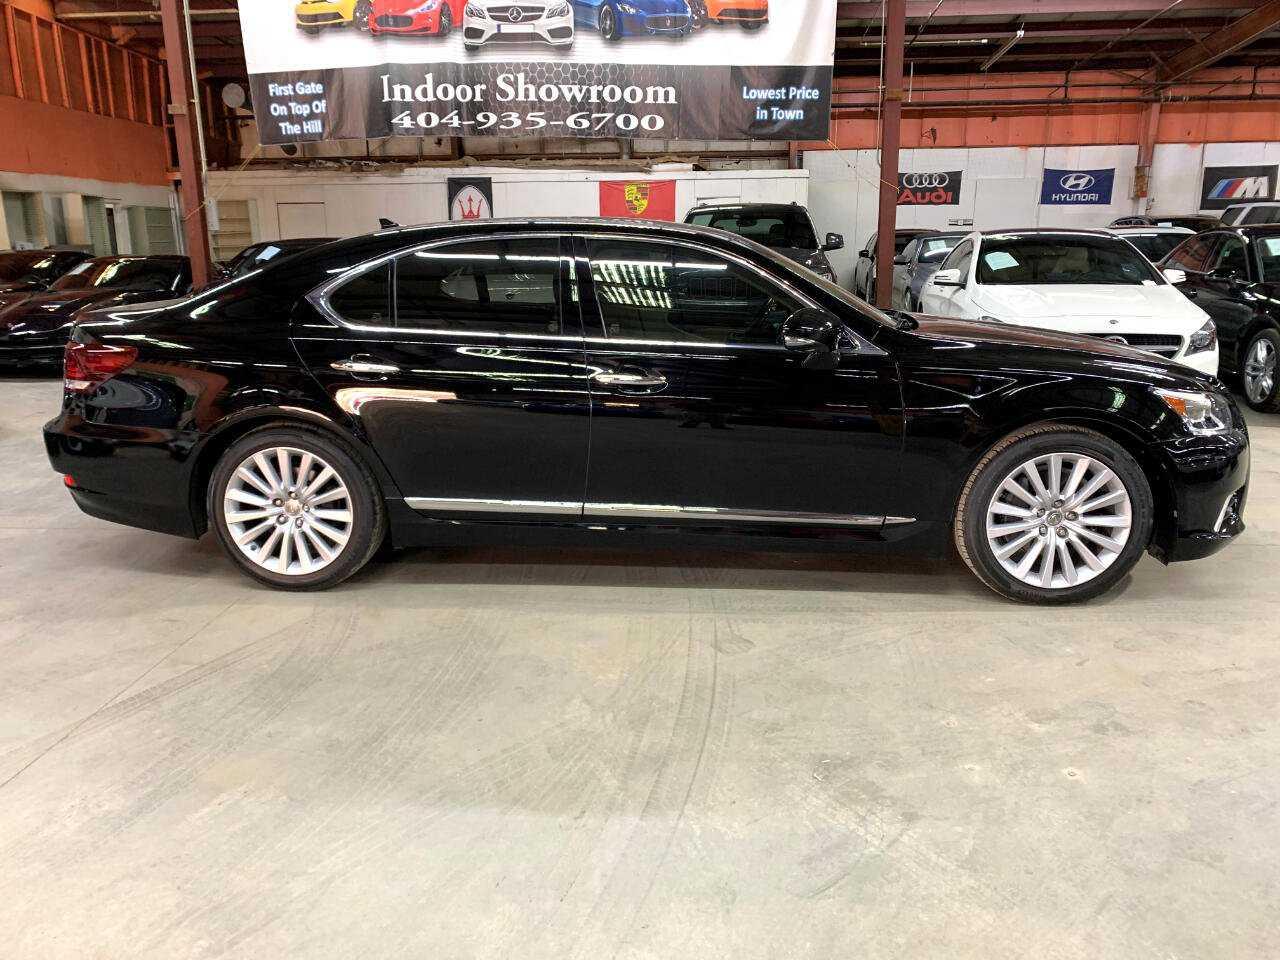 New black Lexus side view